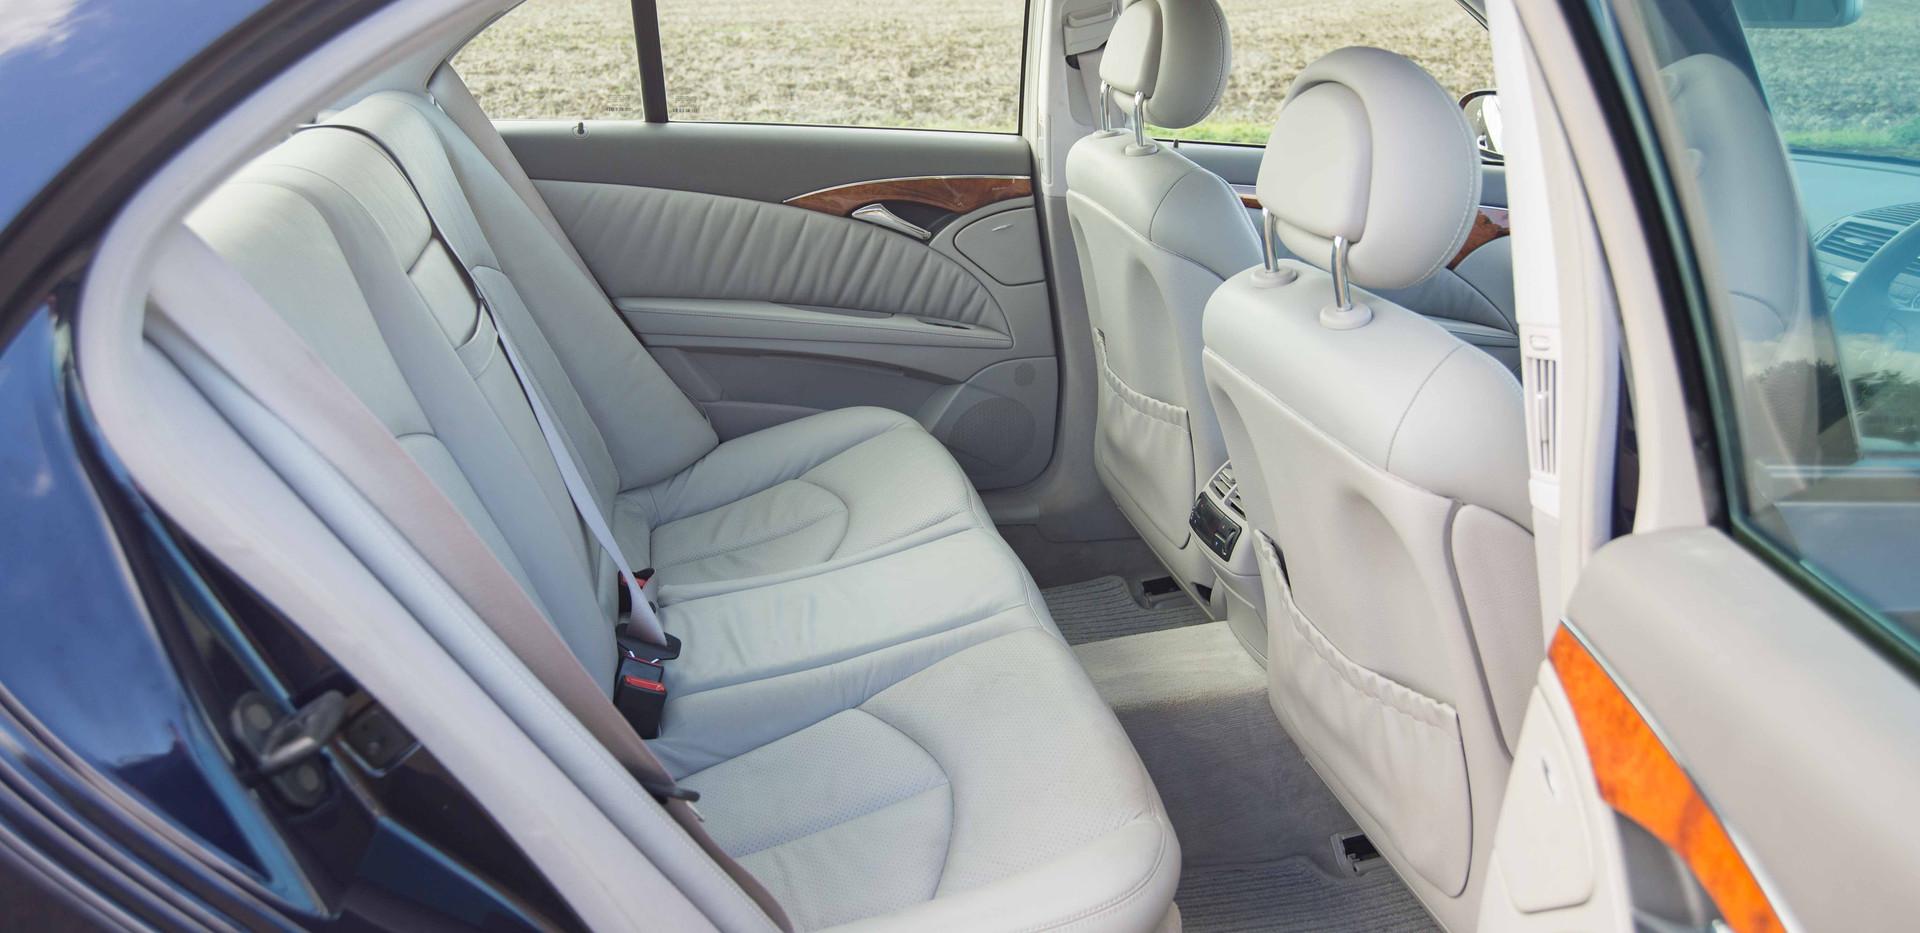 Mercedes E500 For Sale UK London  (39 of